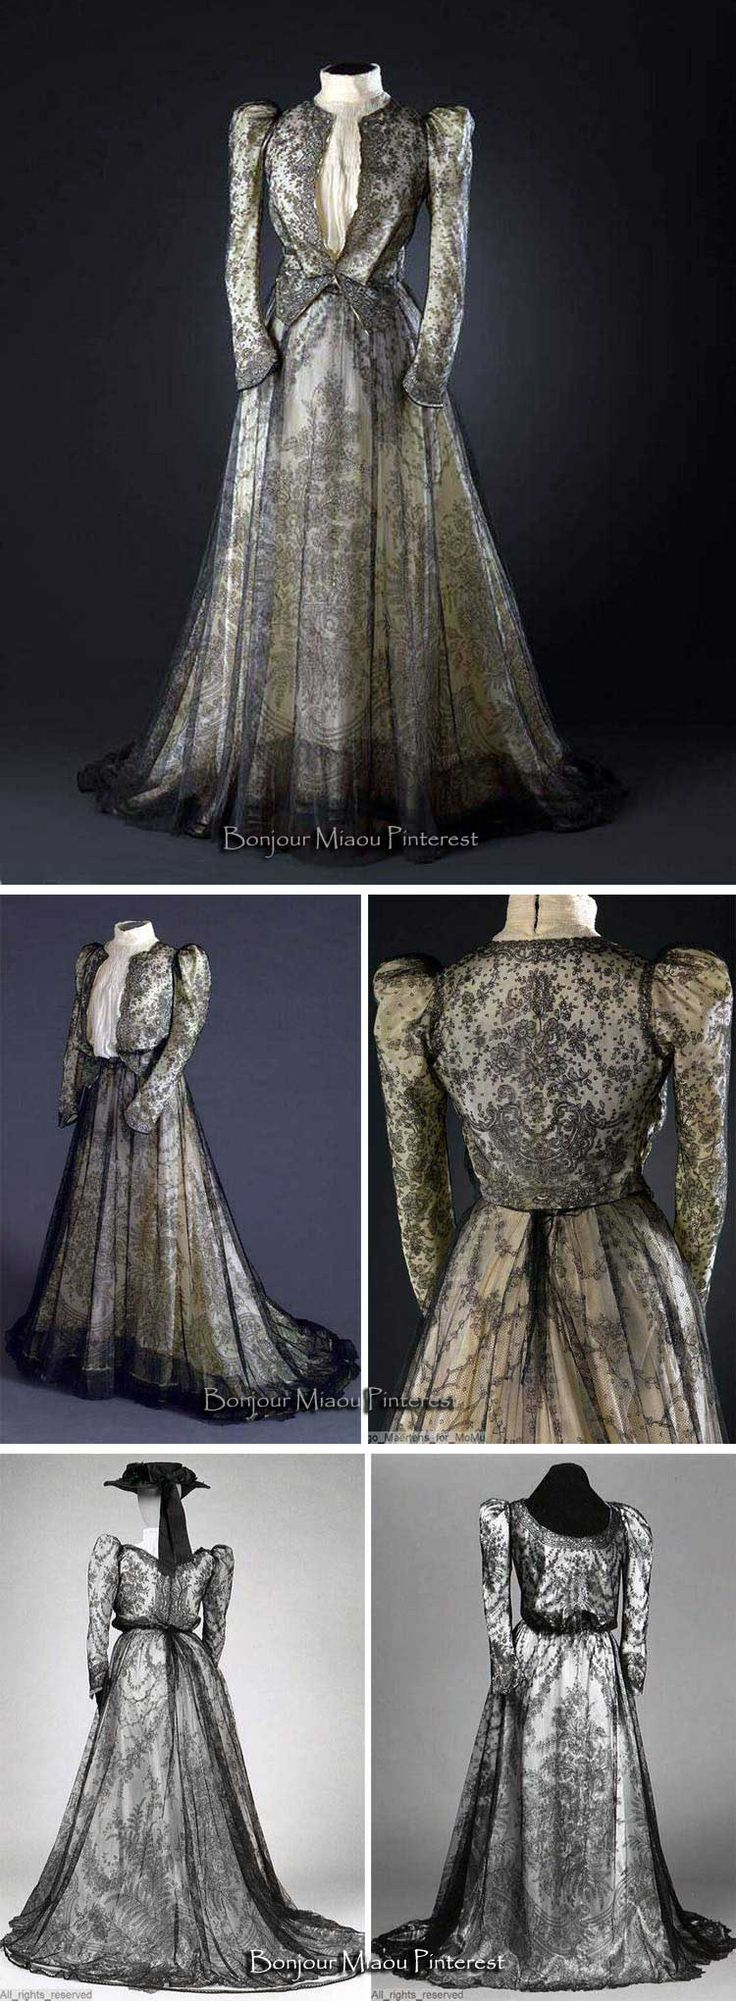 Dress ca. 1900-10. Black silk Chantilly bobbin lace with floral motifs. Mode Museum, Antwerp